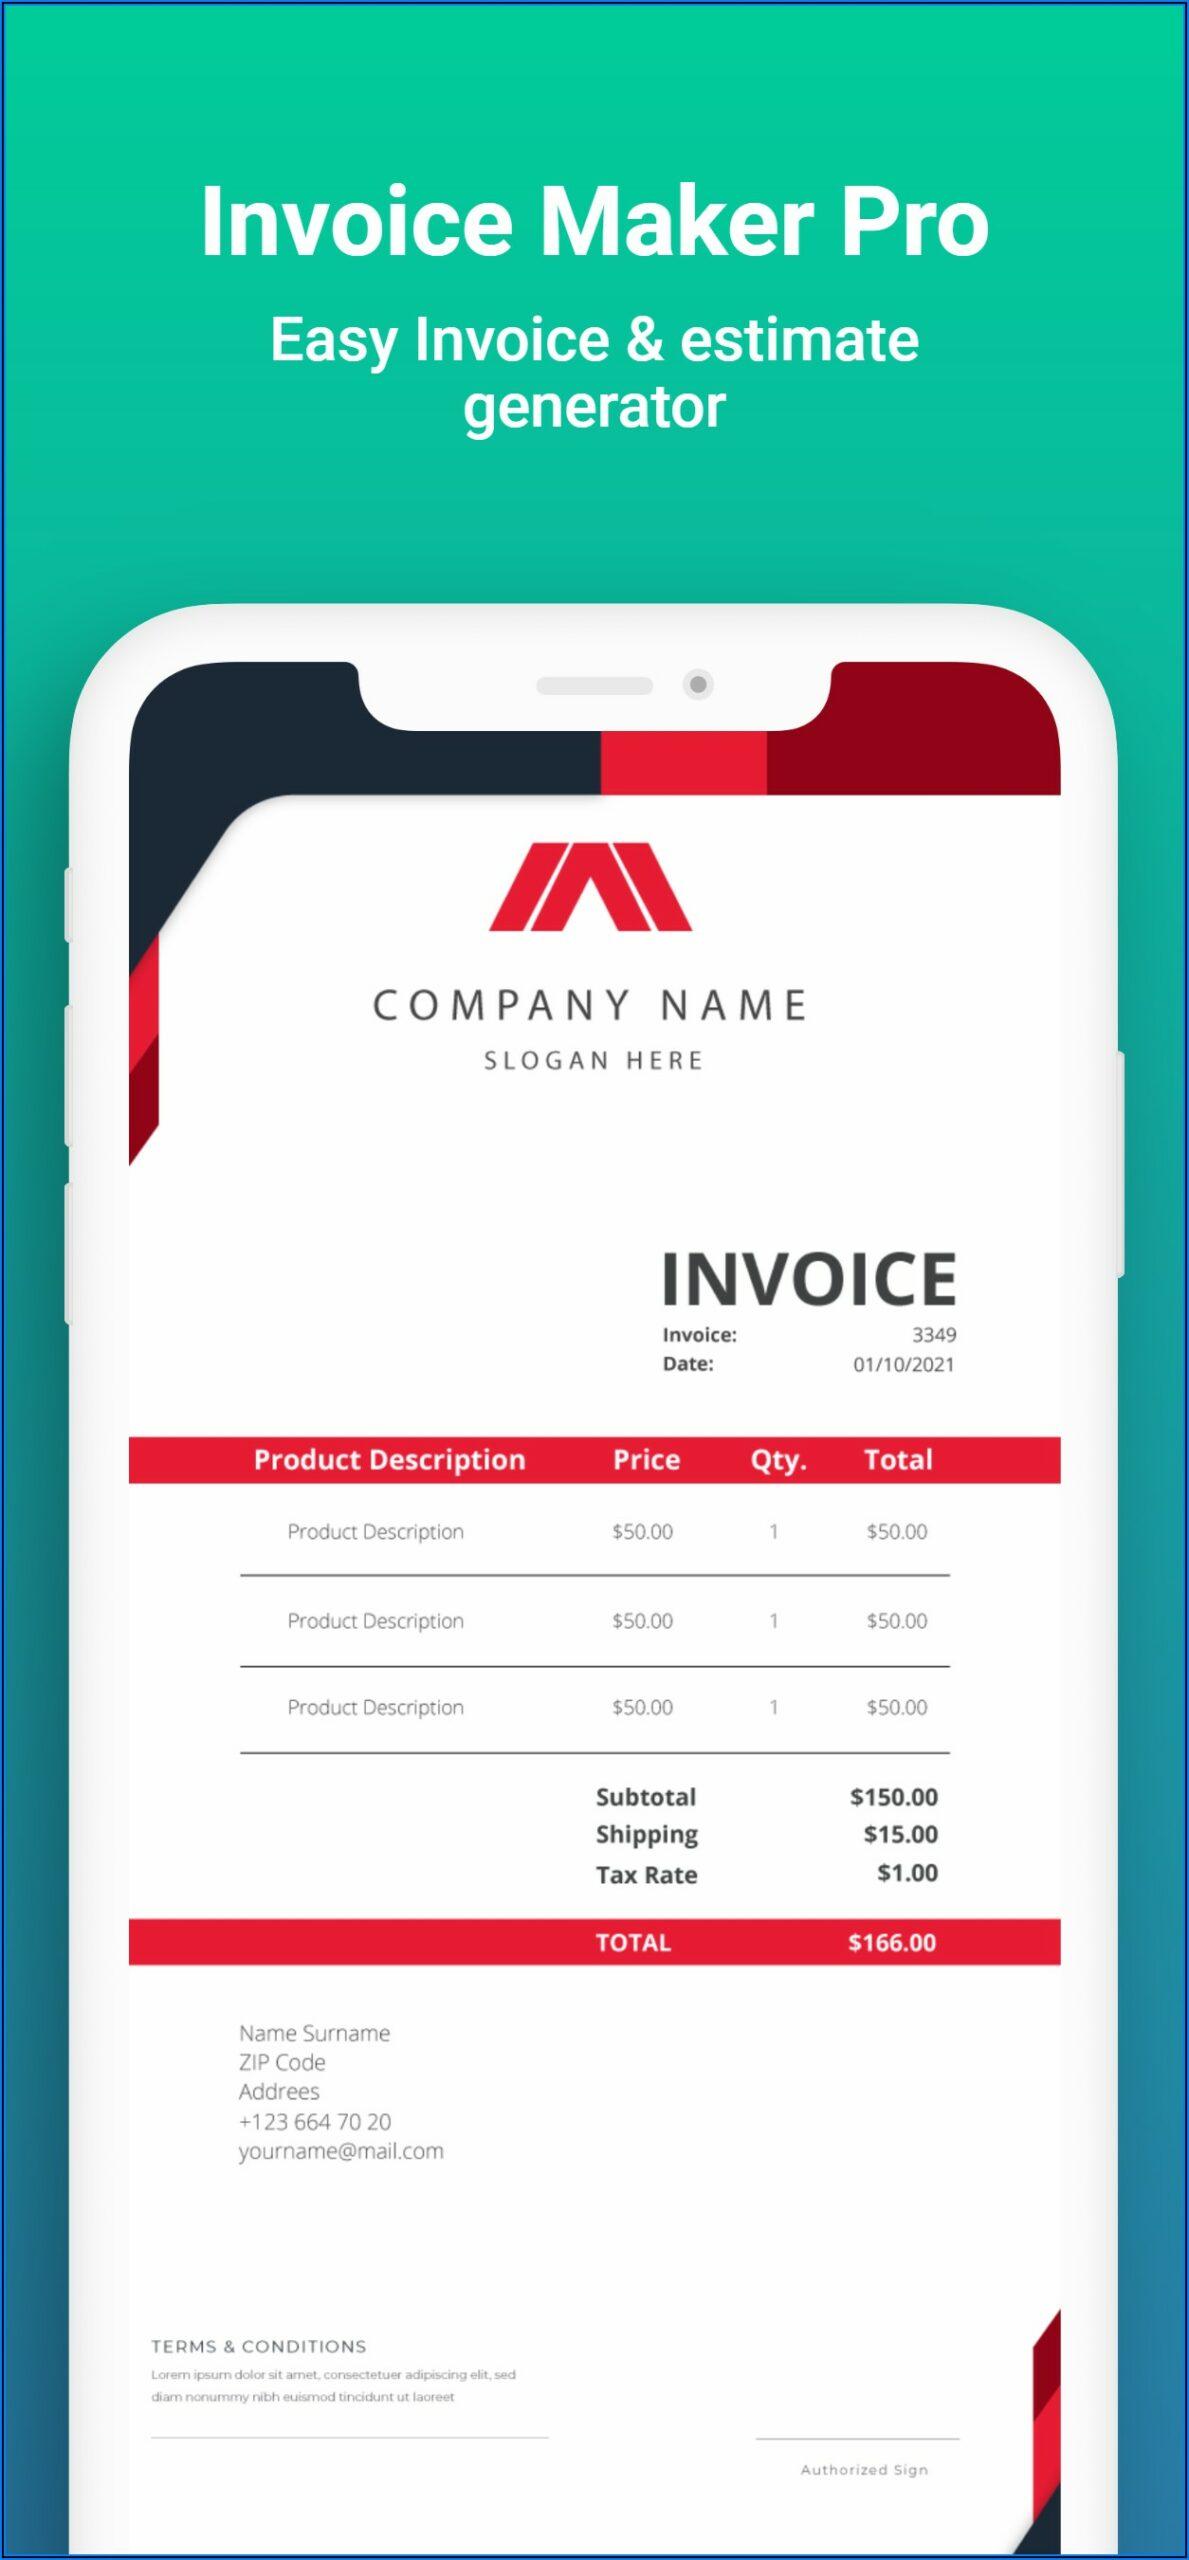 Invoices And Estimates Pro 2.0 Download